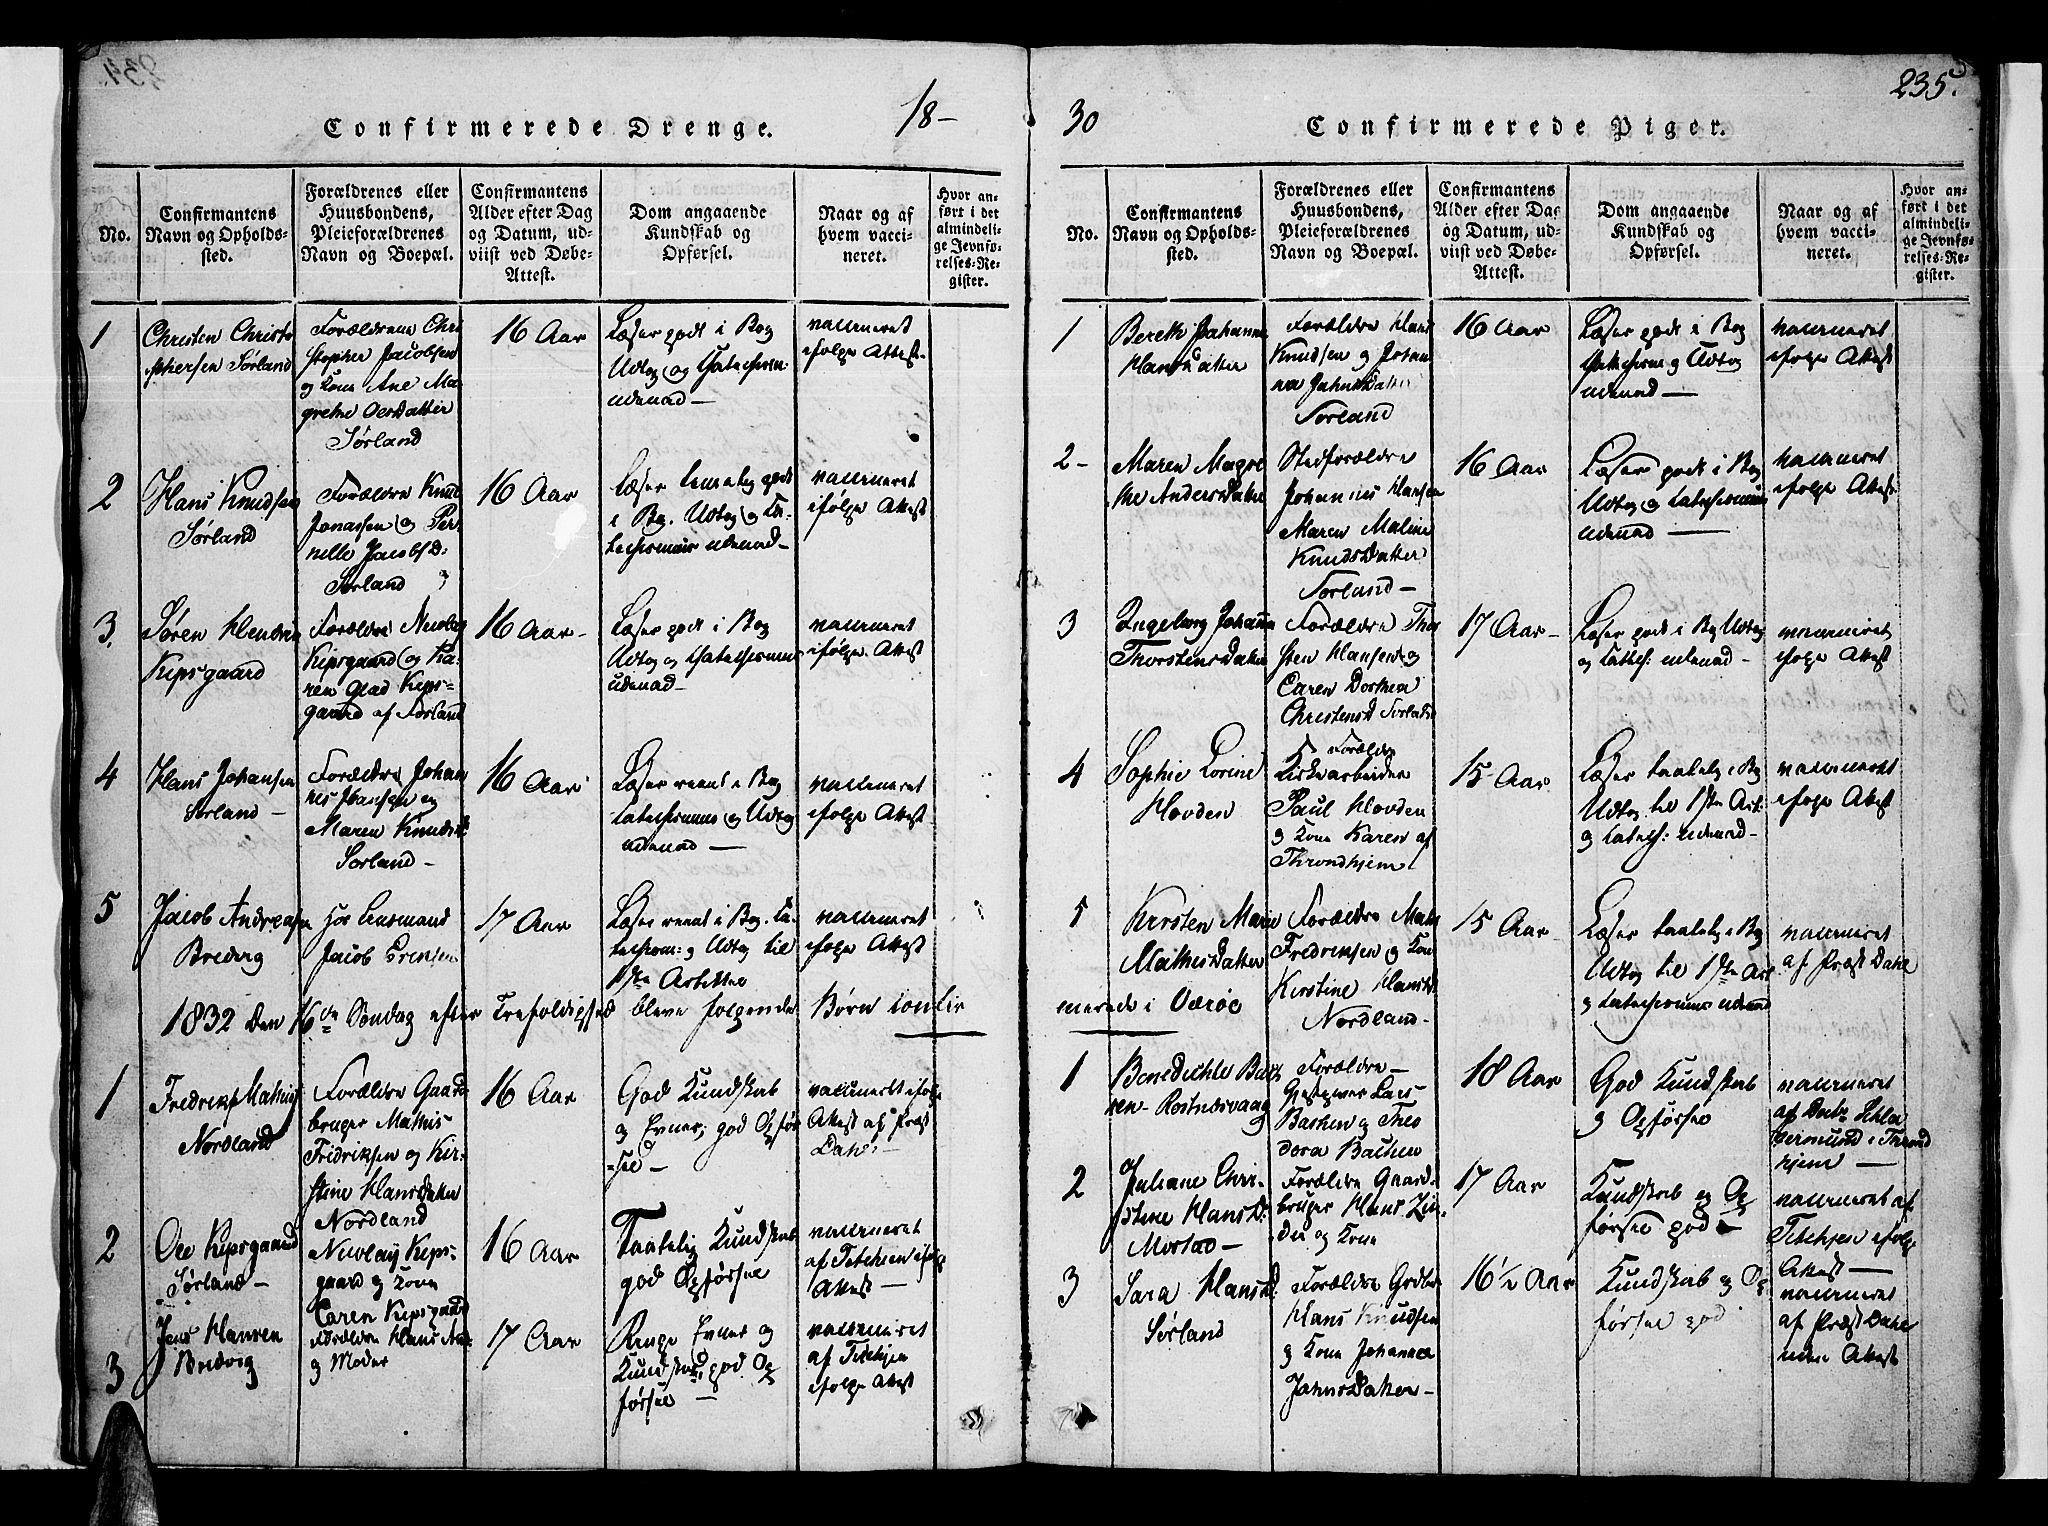 SAT, Ministerialprotokoller, klokkerbøker og fødselsregistre - Nordland, 807/L0120: Ministerialbok nr. 807A03, 1821-1848, s. 235